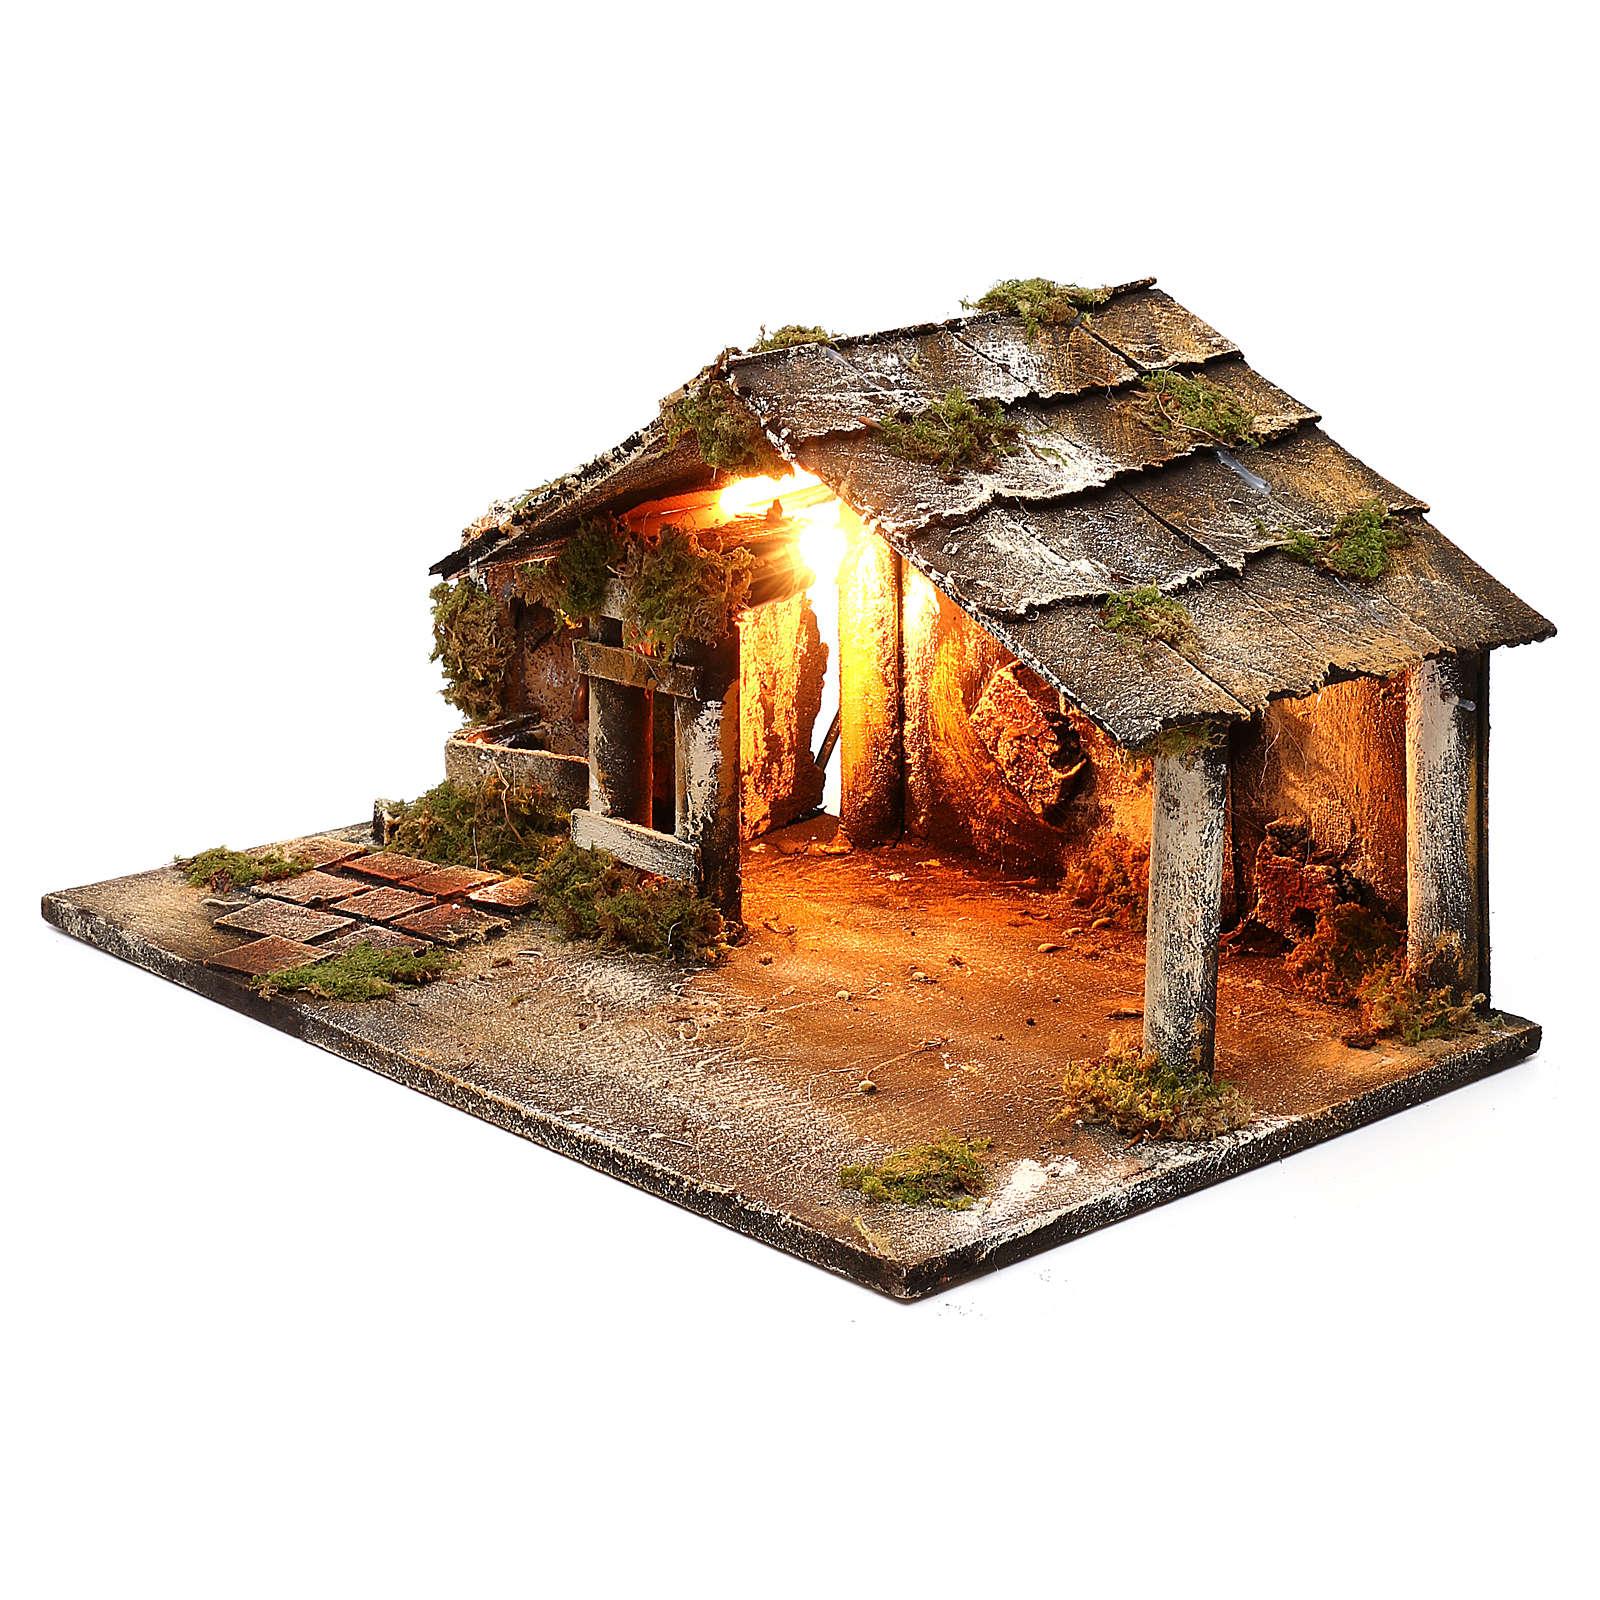 Illuminated stable with fountain for Neapolitan Nativity Scene 26x47x30 cm 4